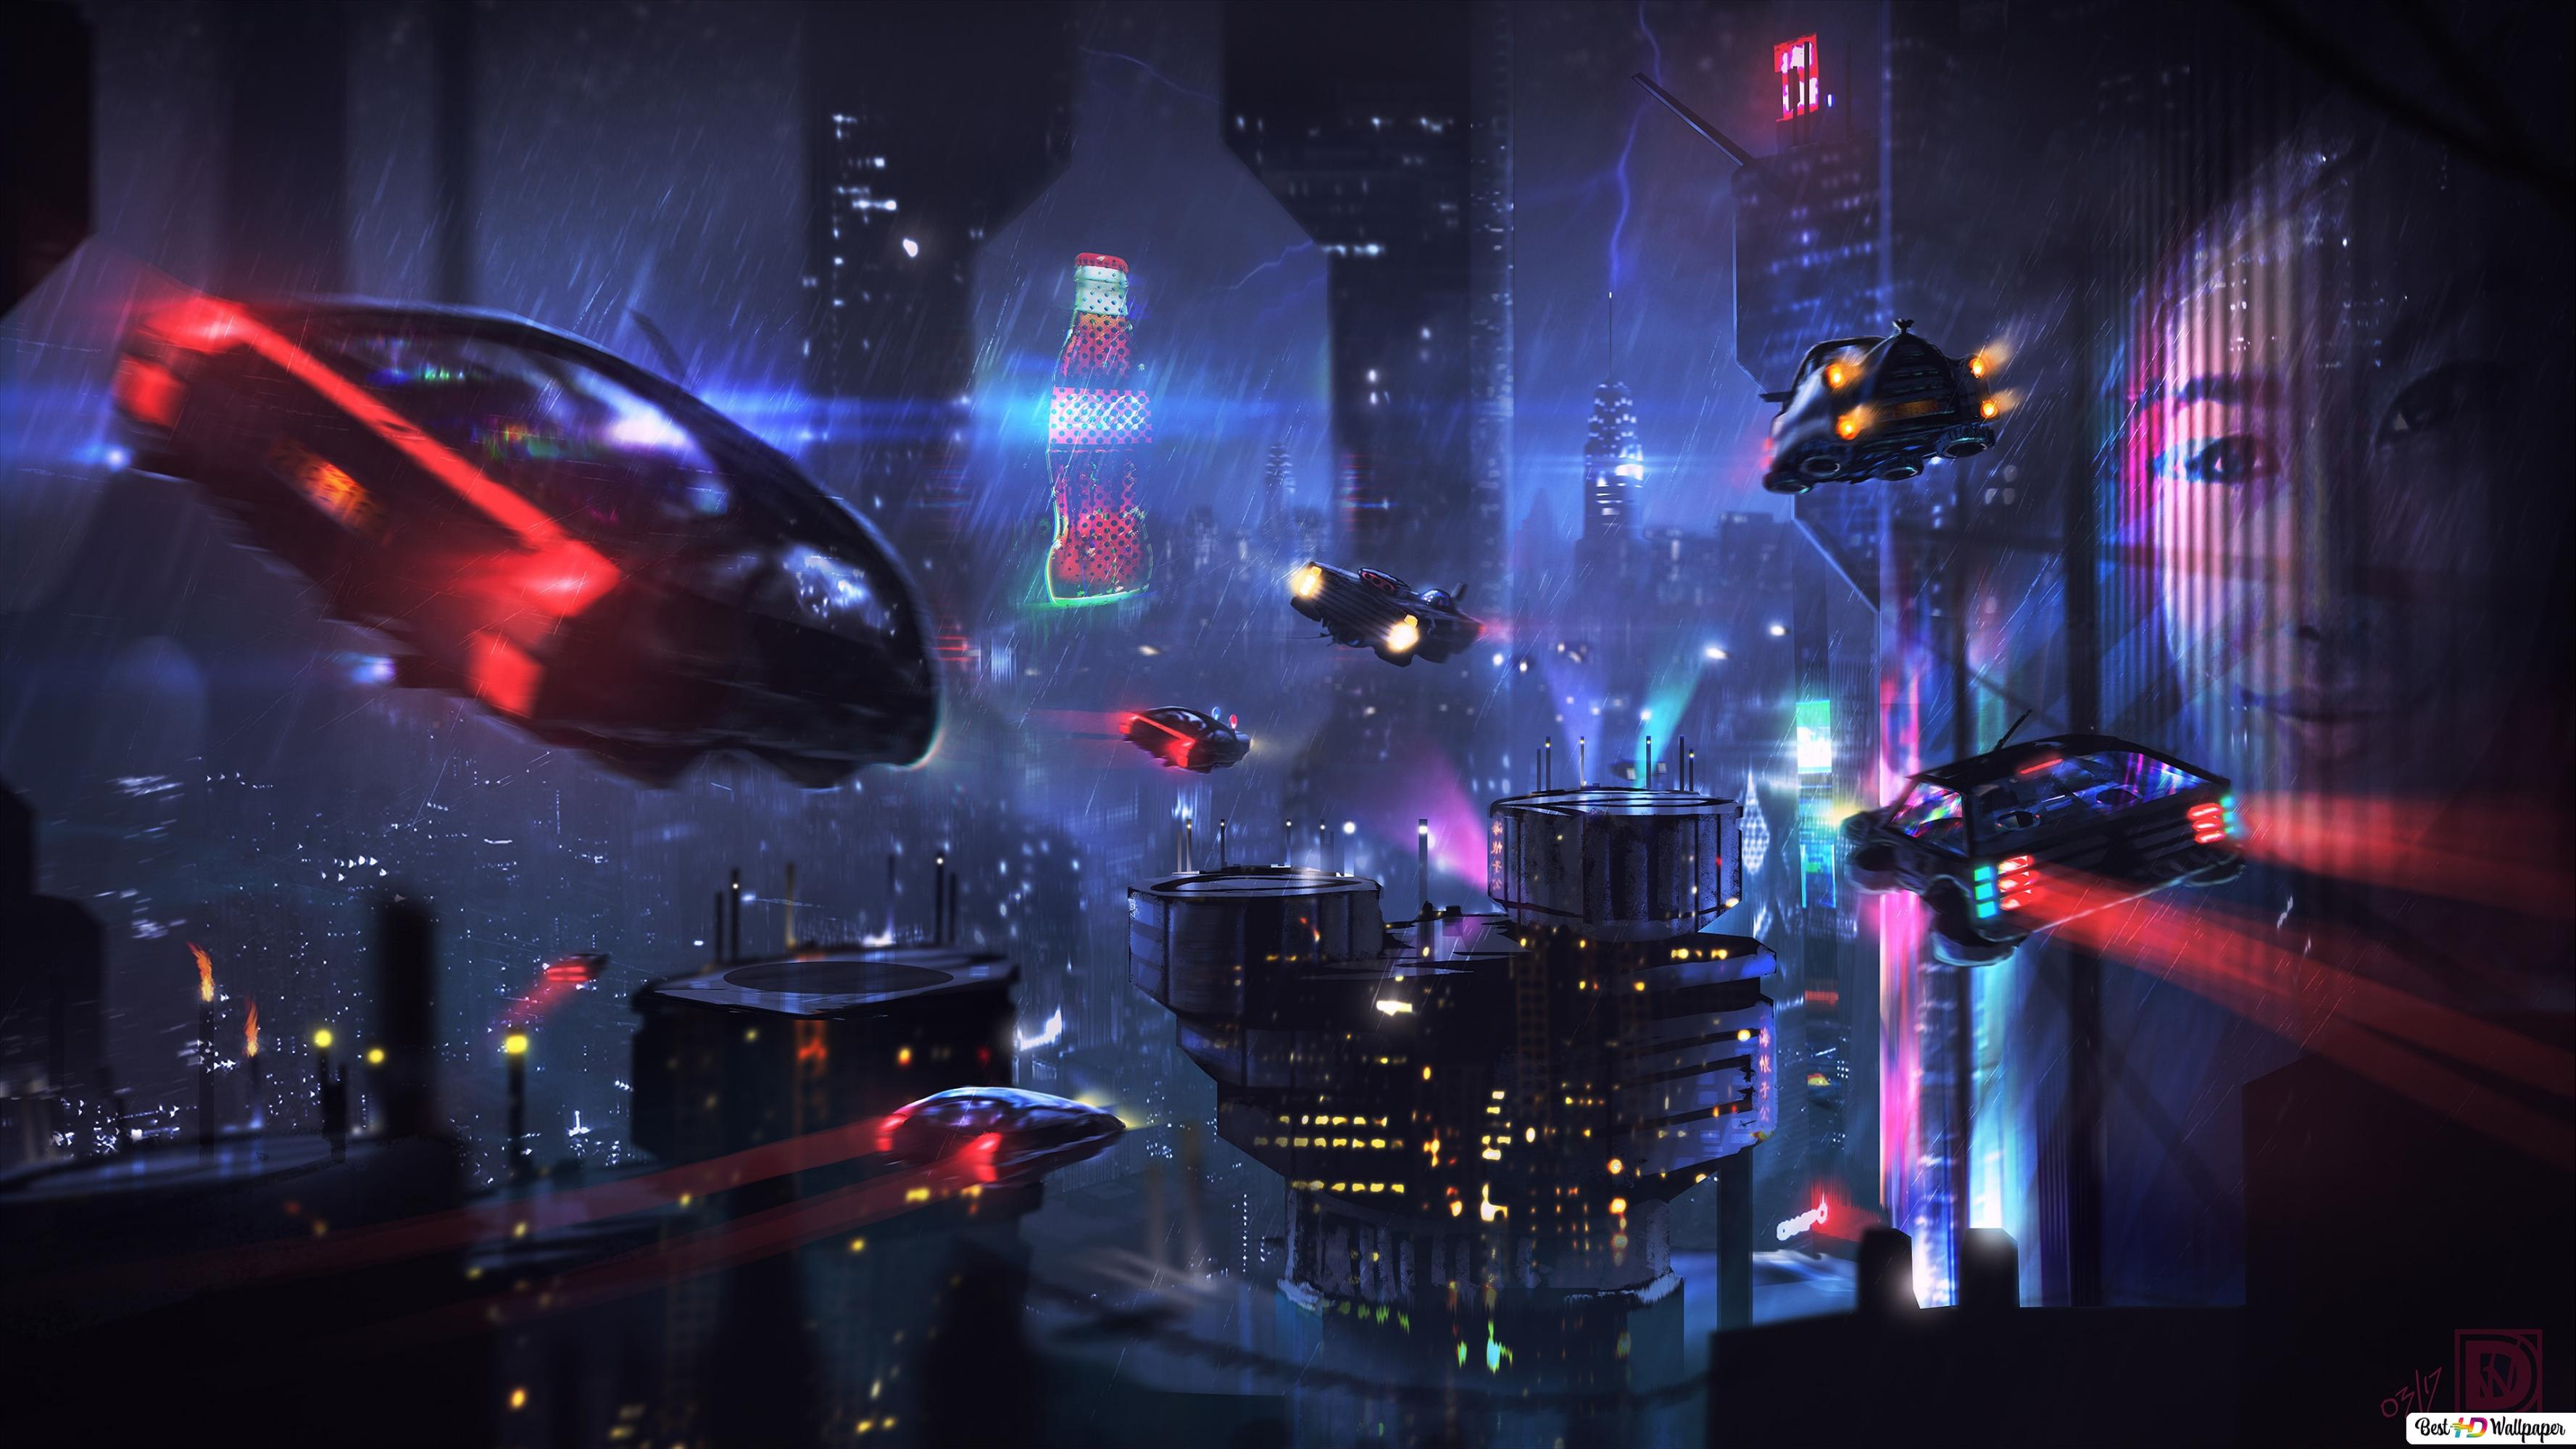 Cyberpunk City Hd Wallpaper Download